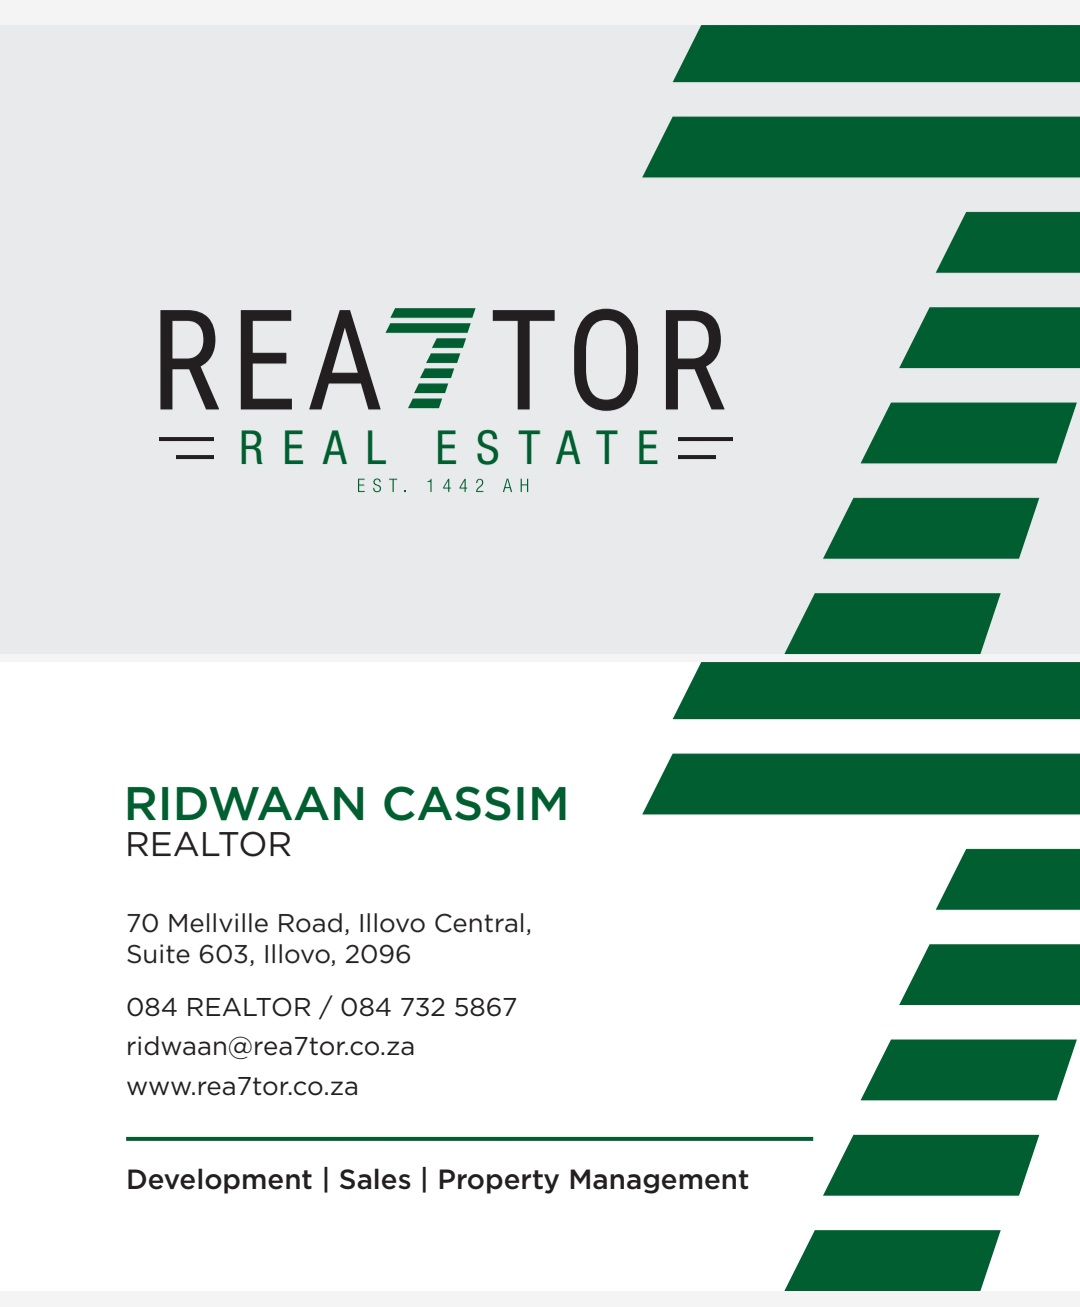 Realtors and Estate Agents in Gauteng